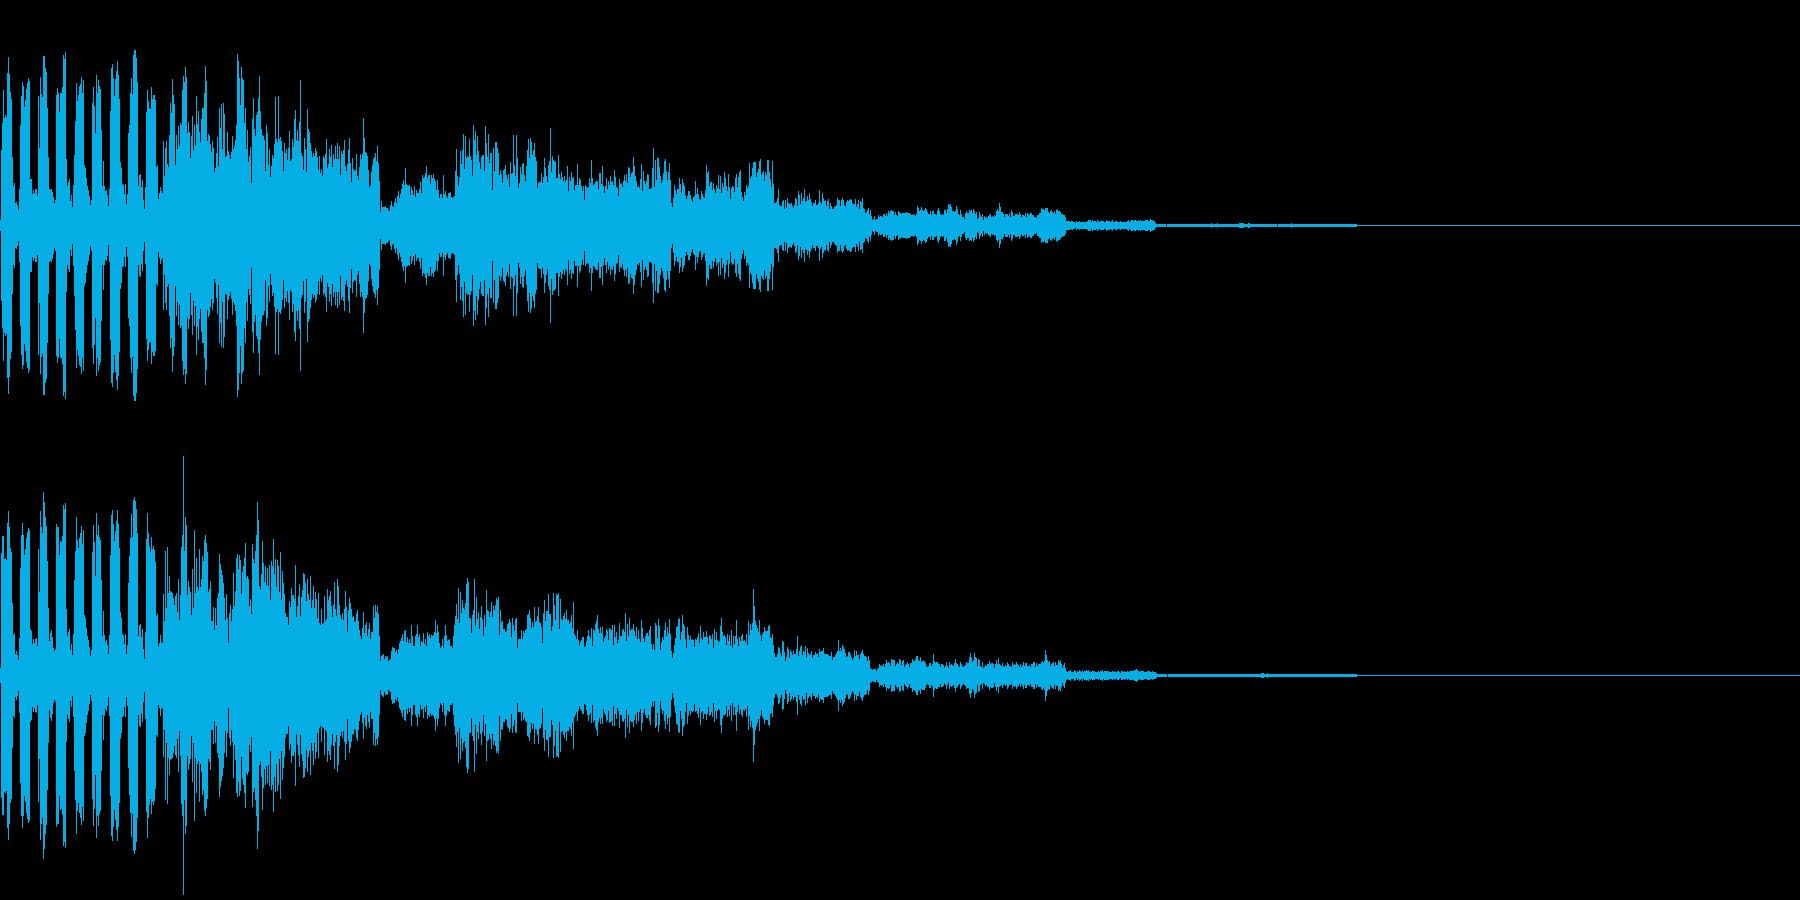 239 FX緊急事態音の再生済みの波形